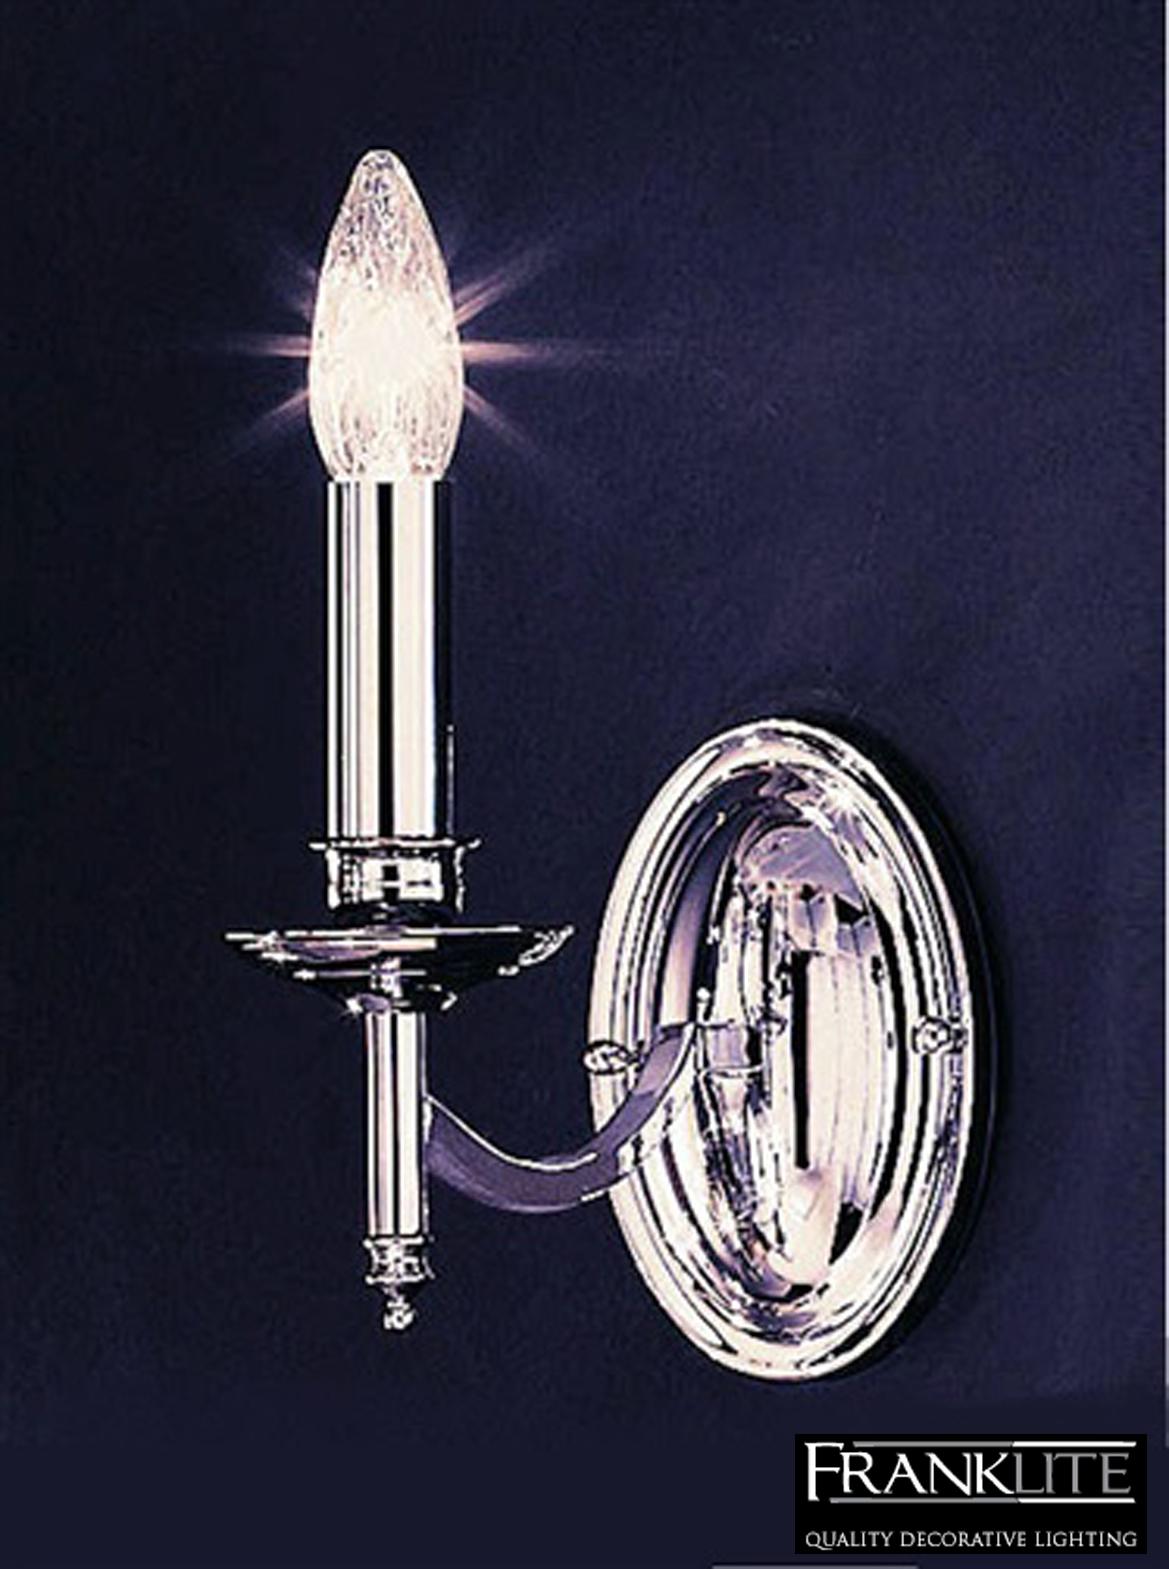 Franklite Petrushka Polished Chrome Finish Single Wall Light - FL2090/1 from Easy Lighting